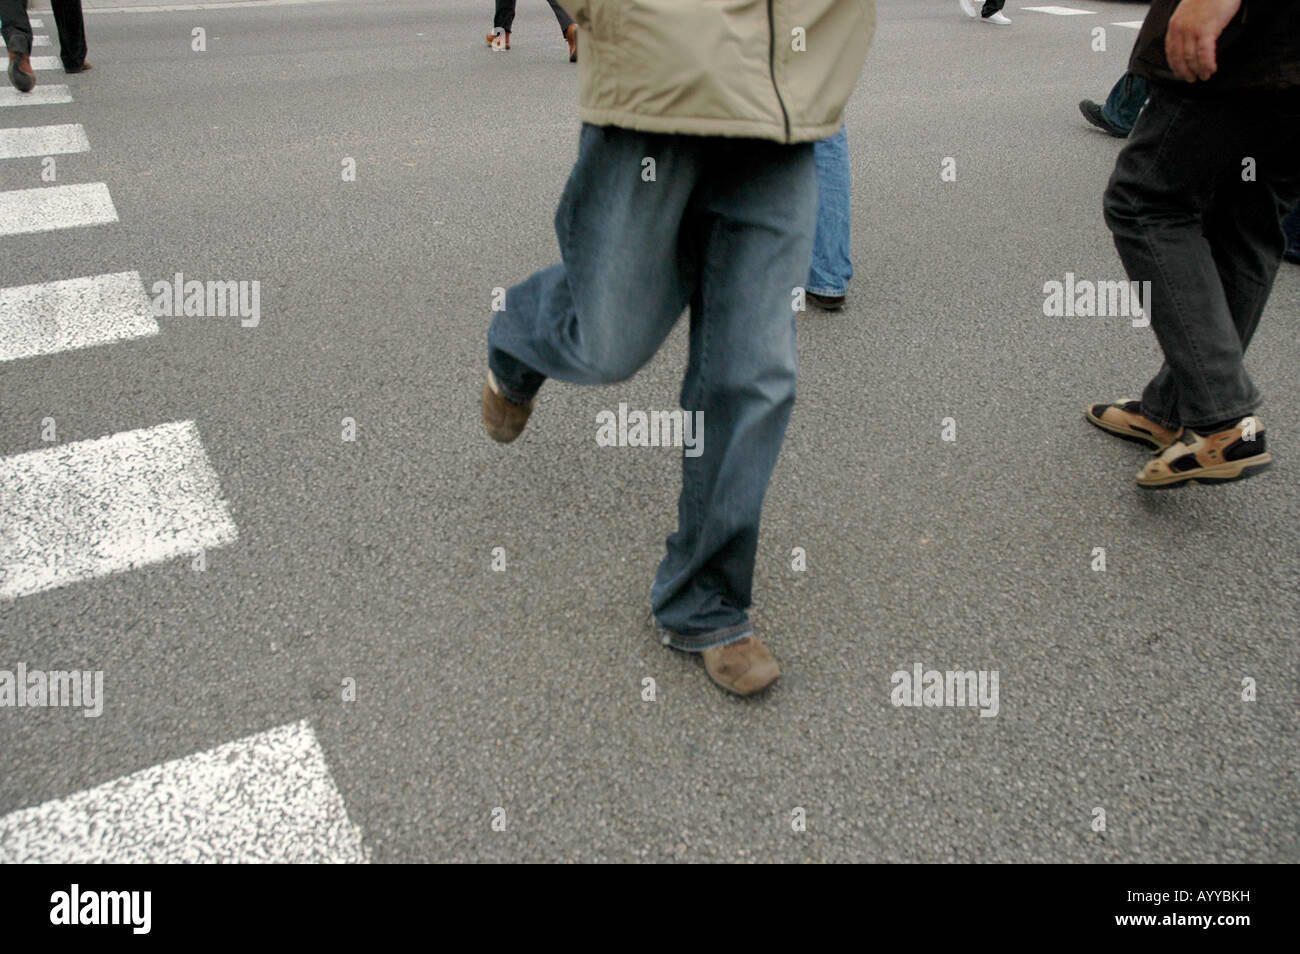 Strasse street Straße Fussgänger foot passenger pedestrians walkers Überqueren crossing Asphalt asphalt Füsse feet Stock Photo